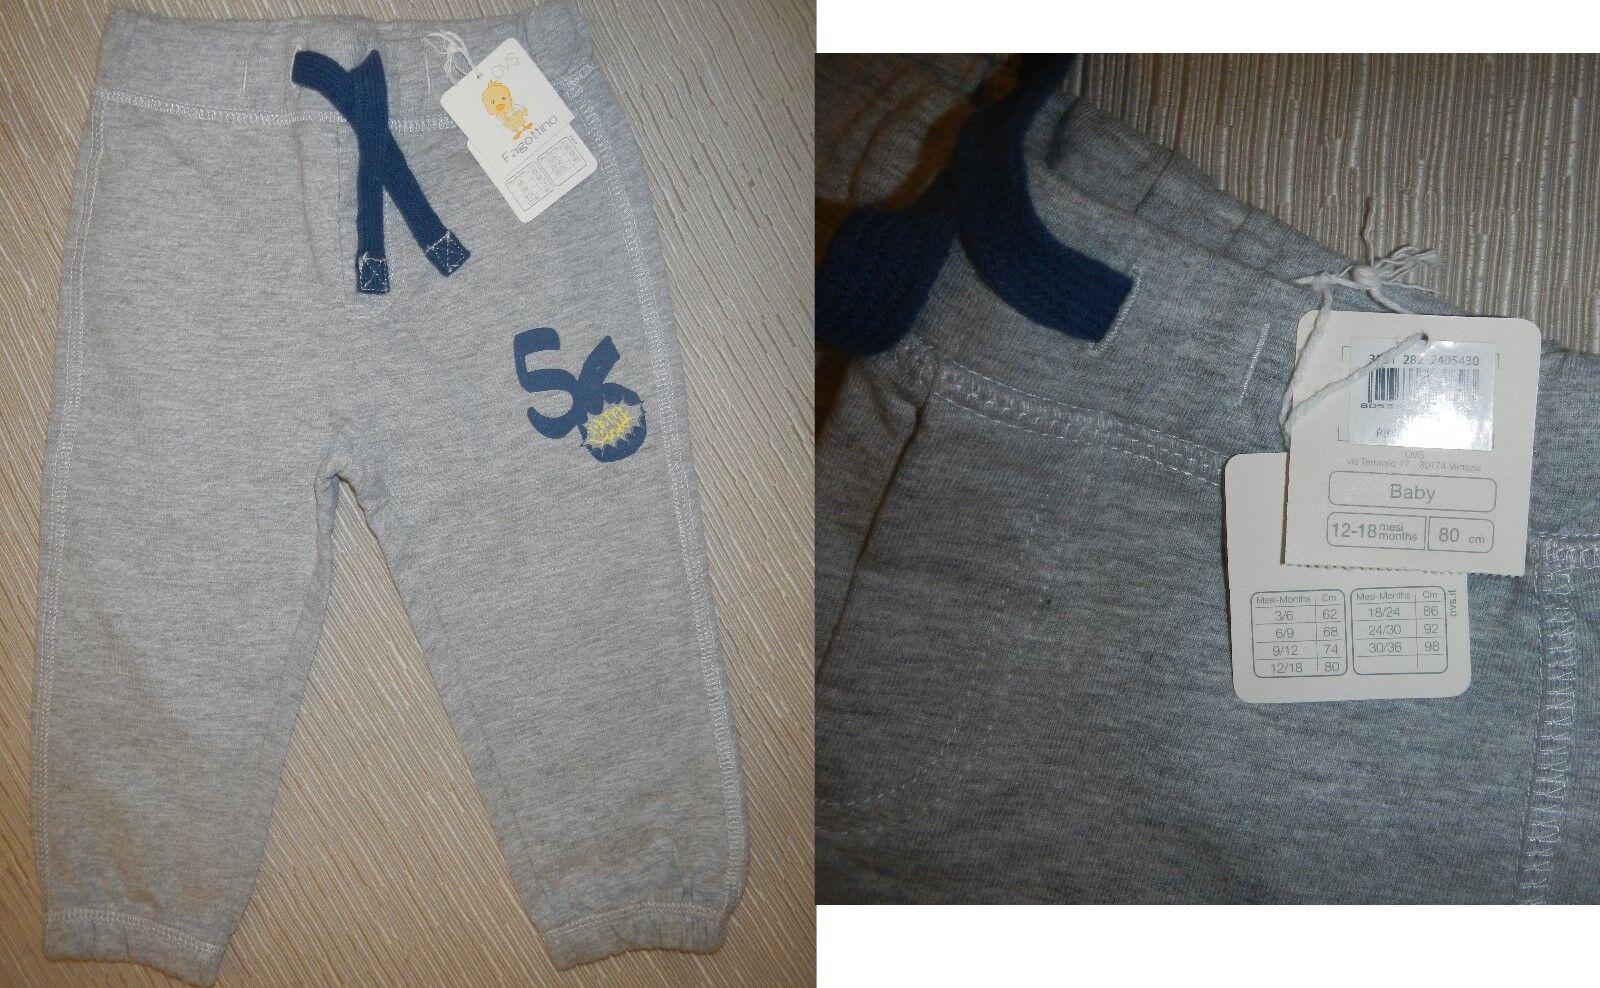 Pantaloni Cotone Fagottino OVS 12 - 18 Mesi 80 Cm - Natale - 4,00€